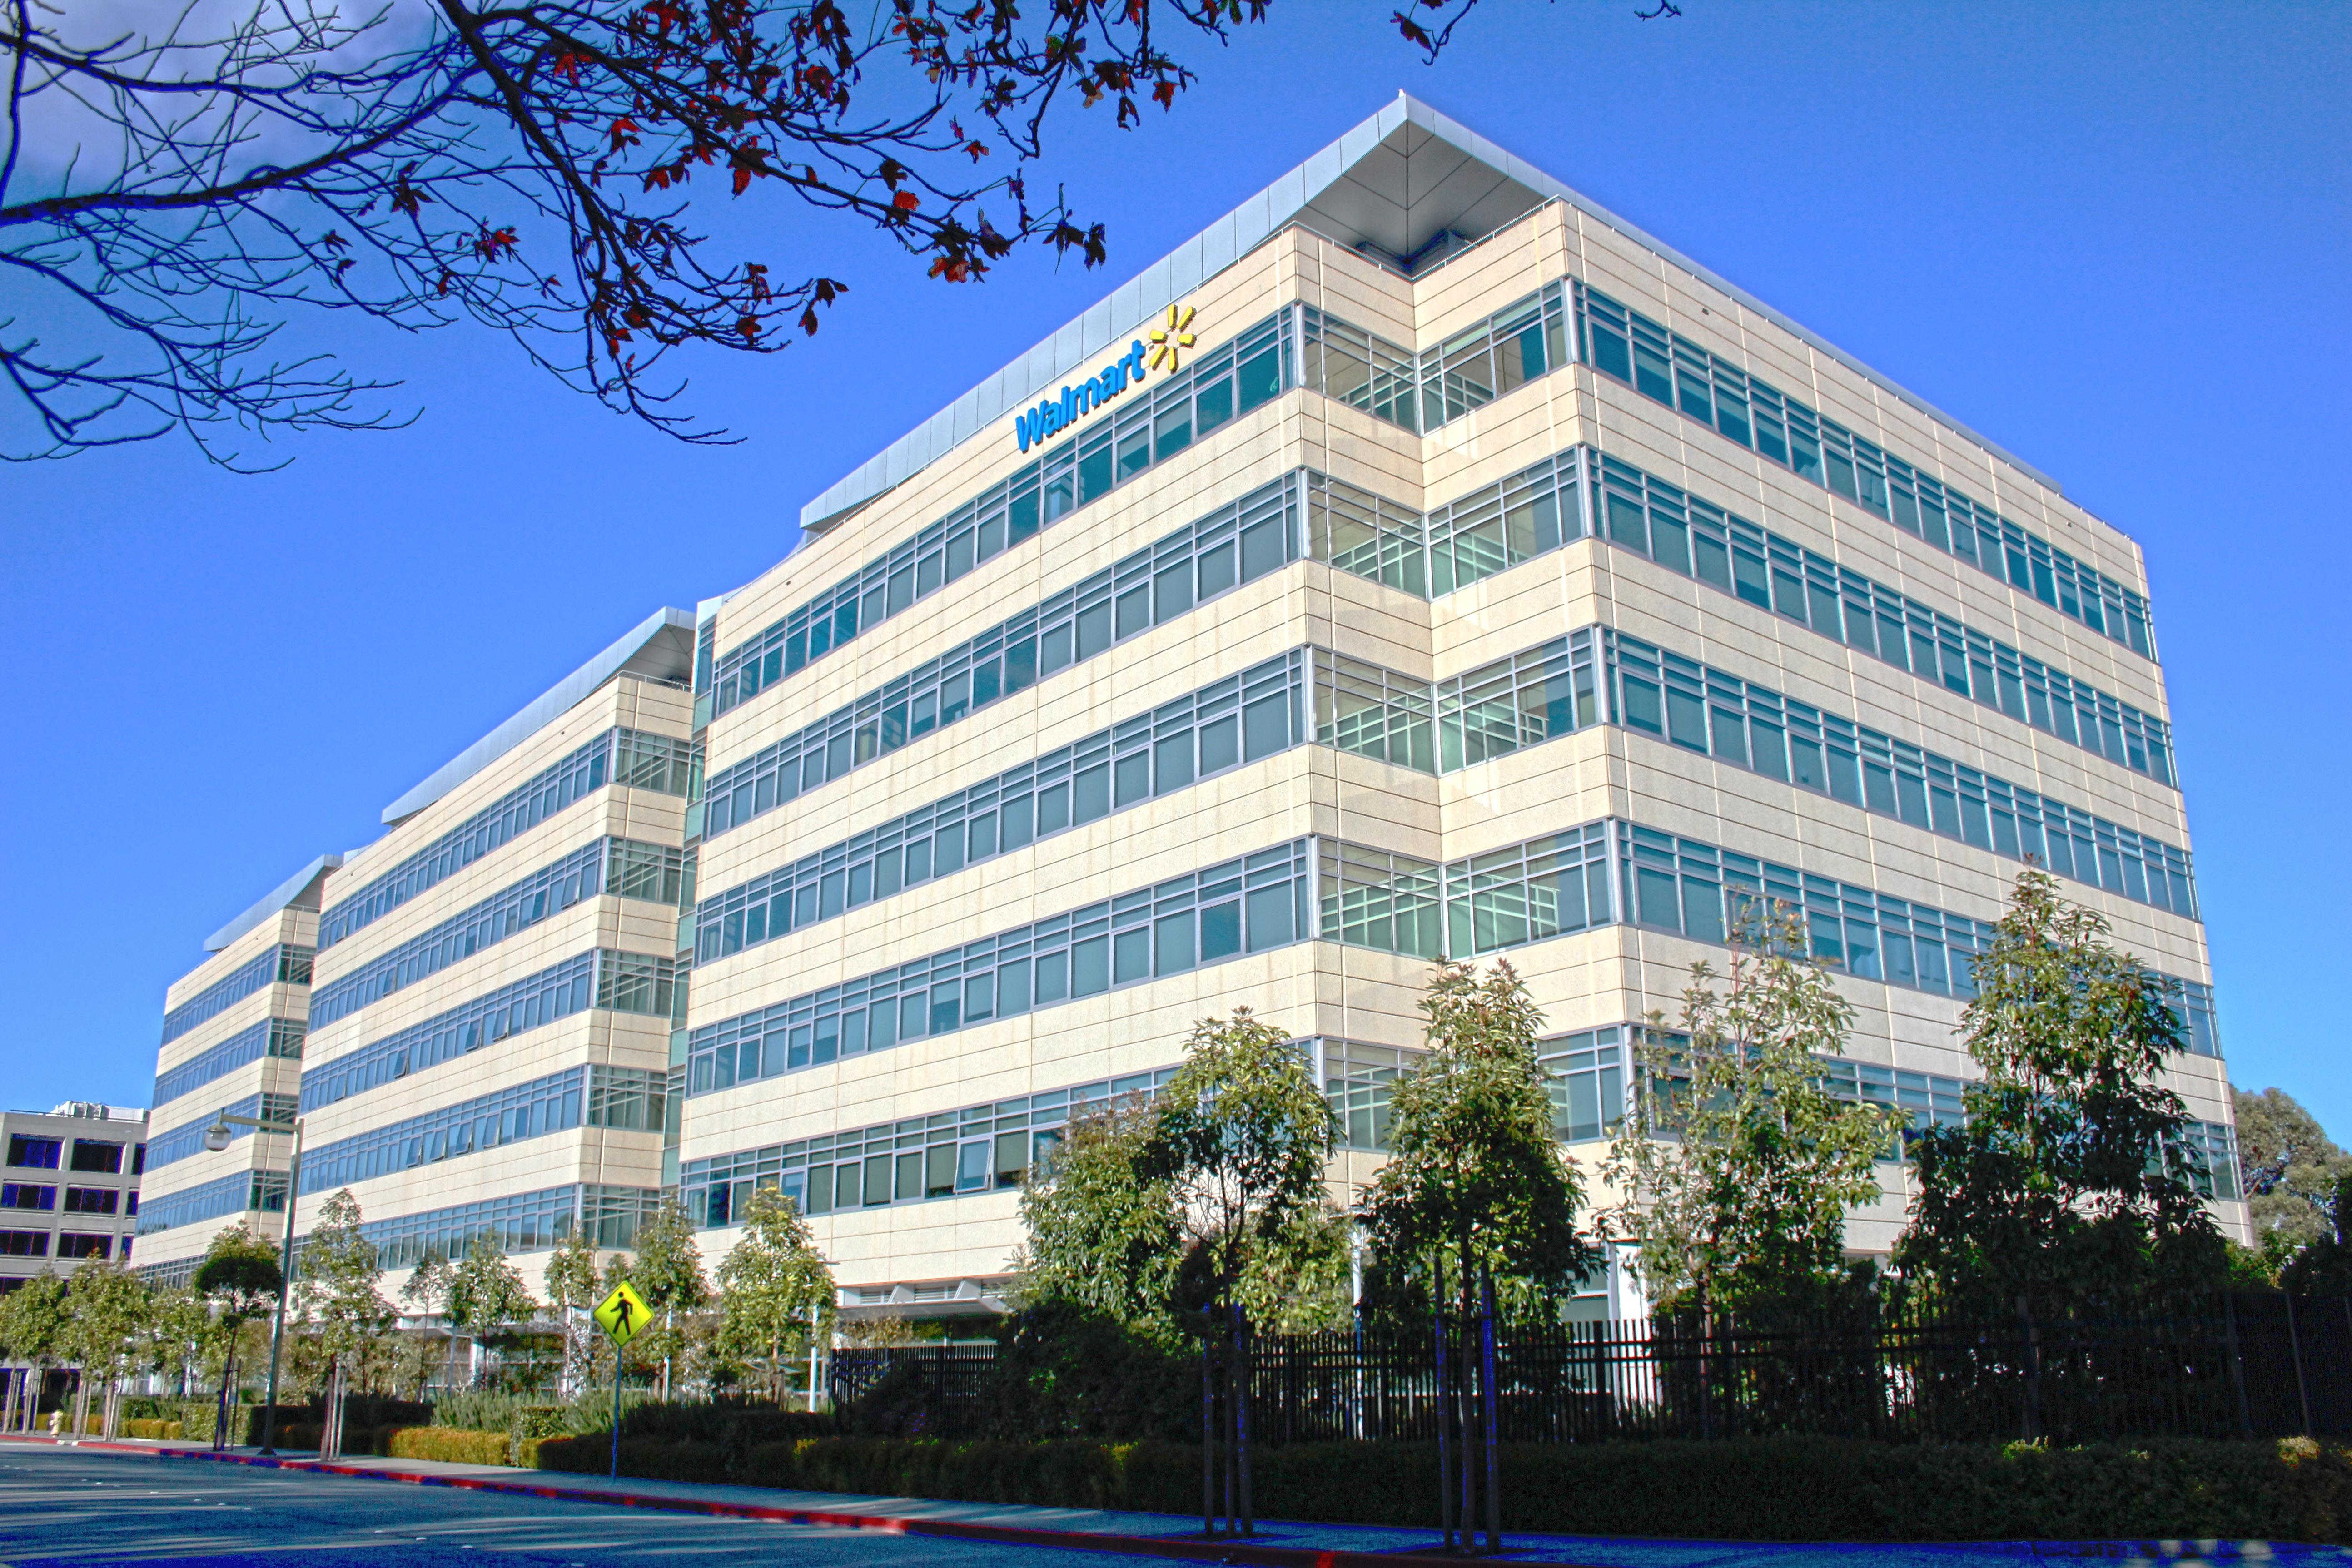 Walmart Global eCommerce headquarters